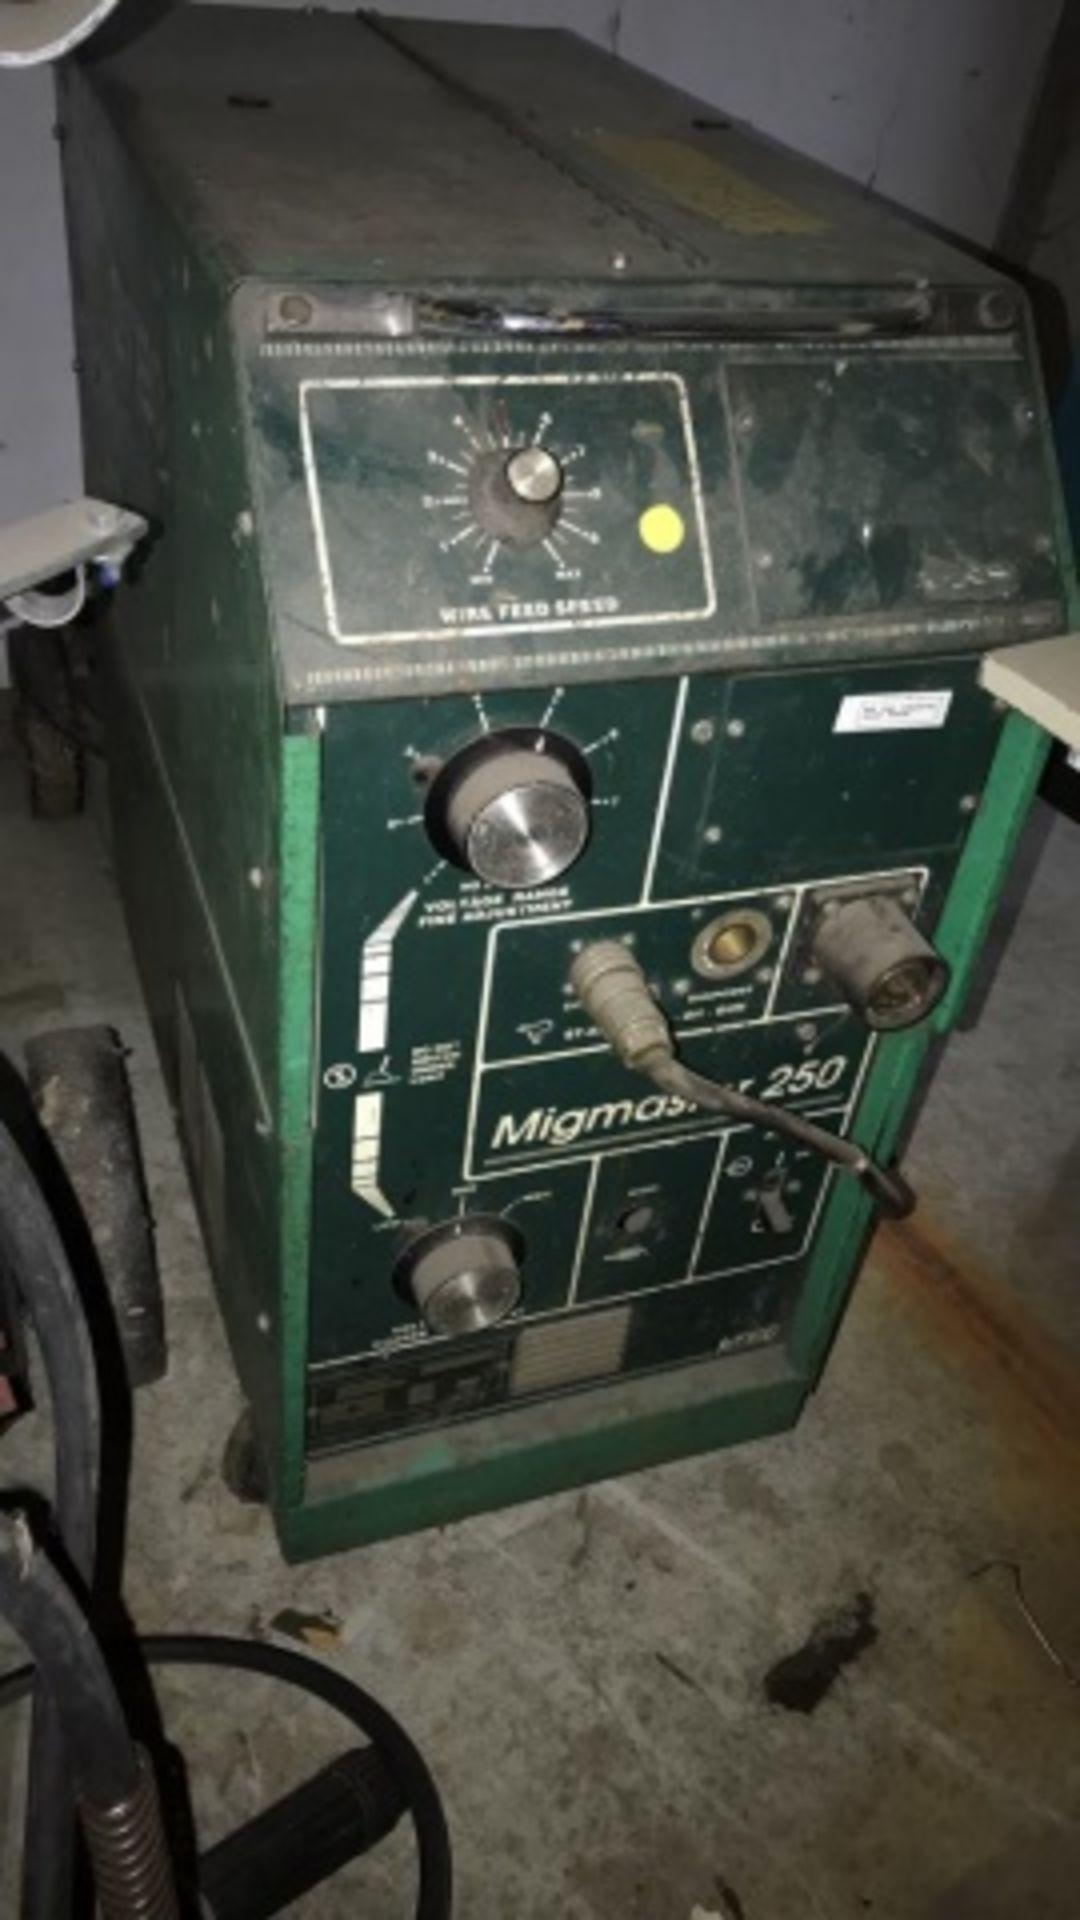 L-Tec Mig Master 250 mig welder - Image 2 of 2